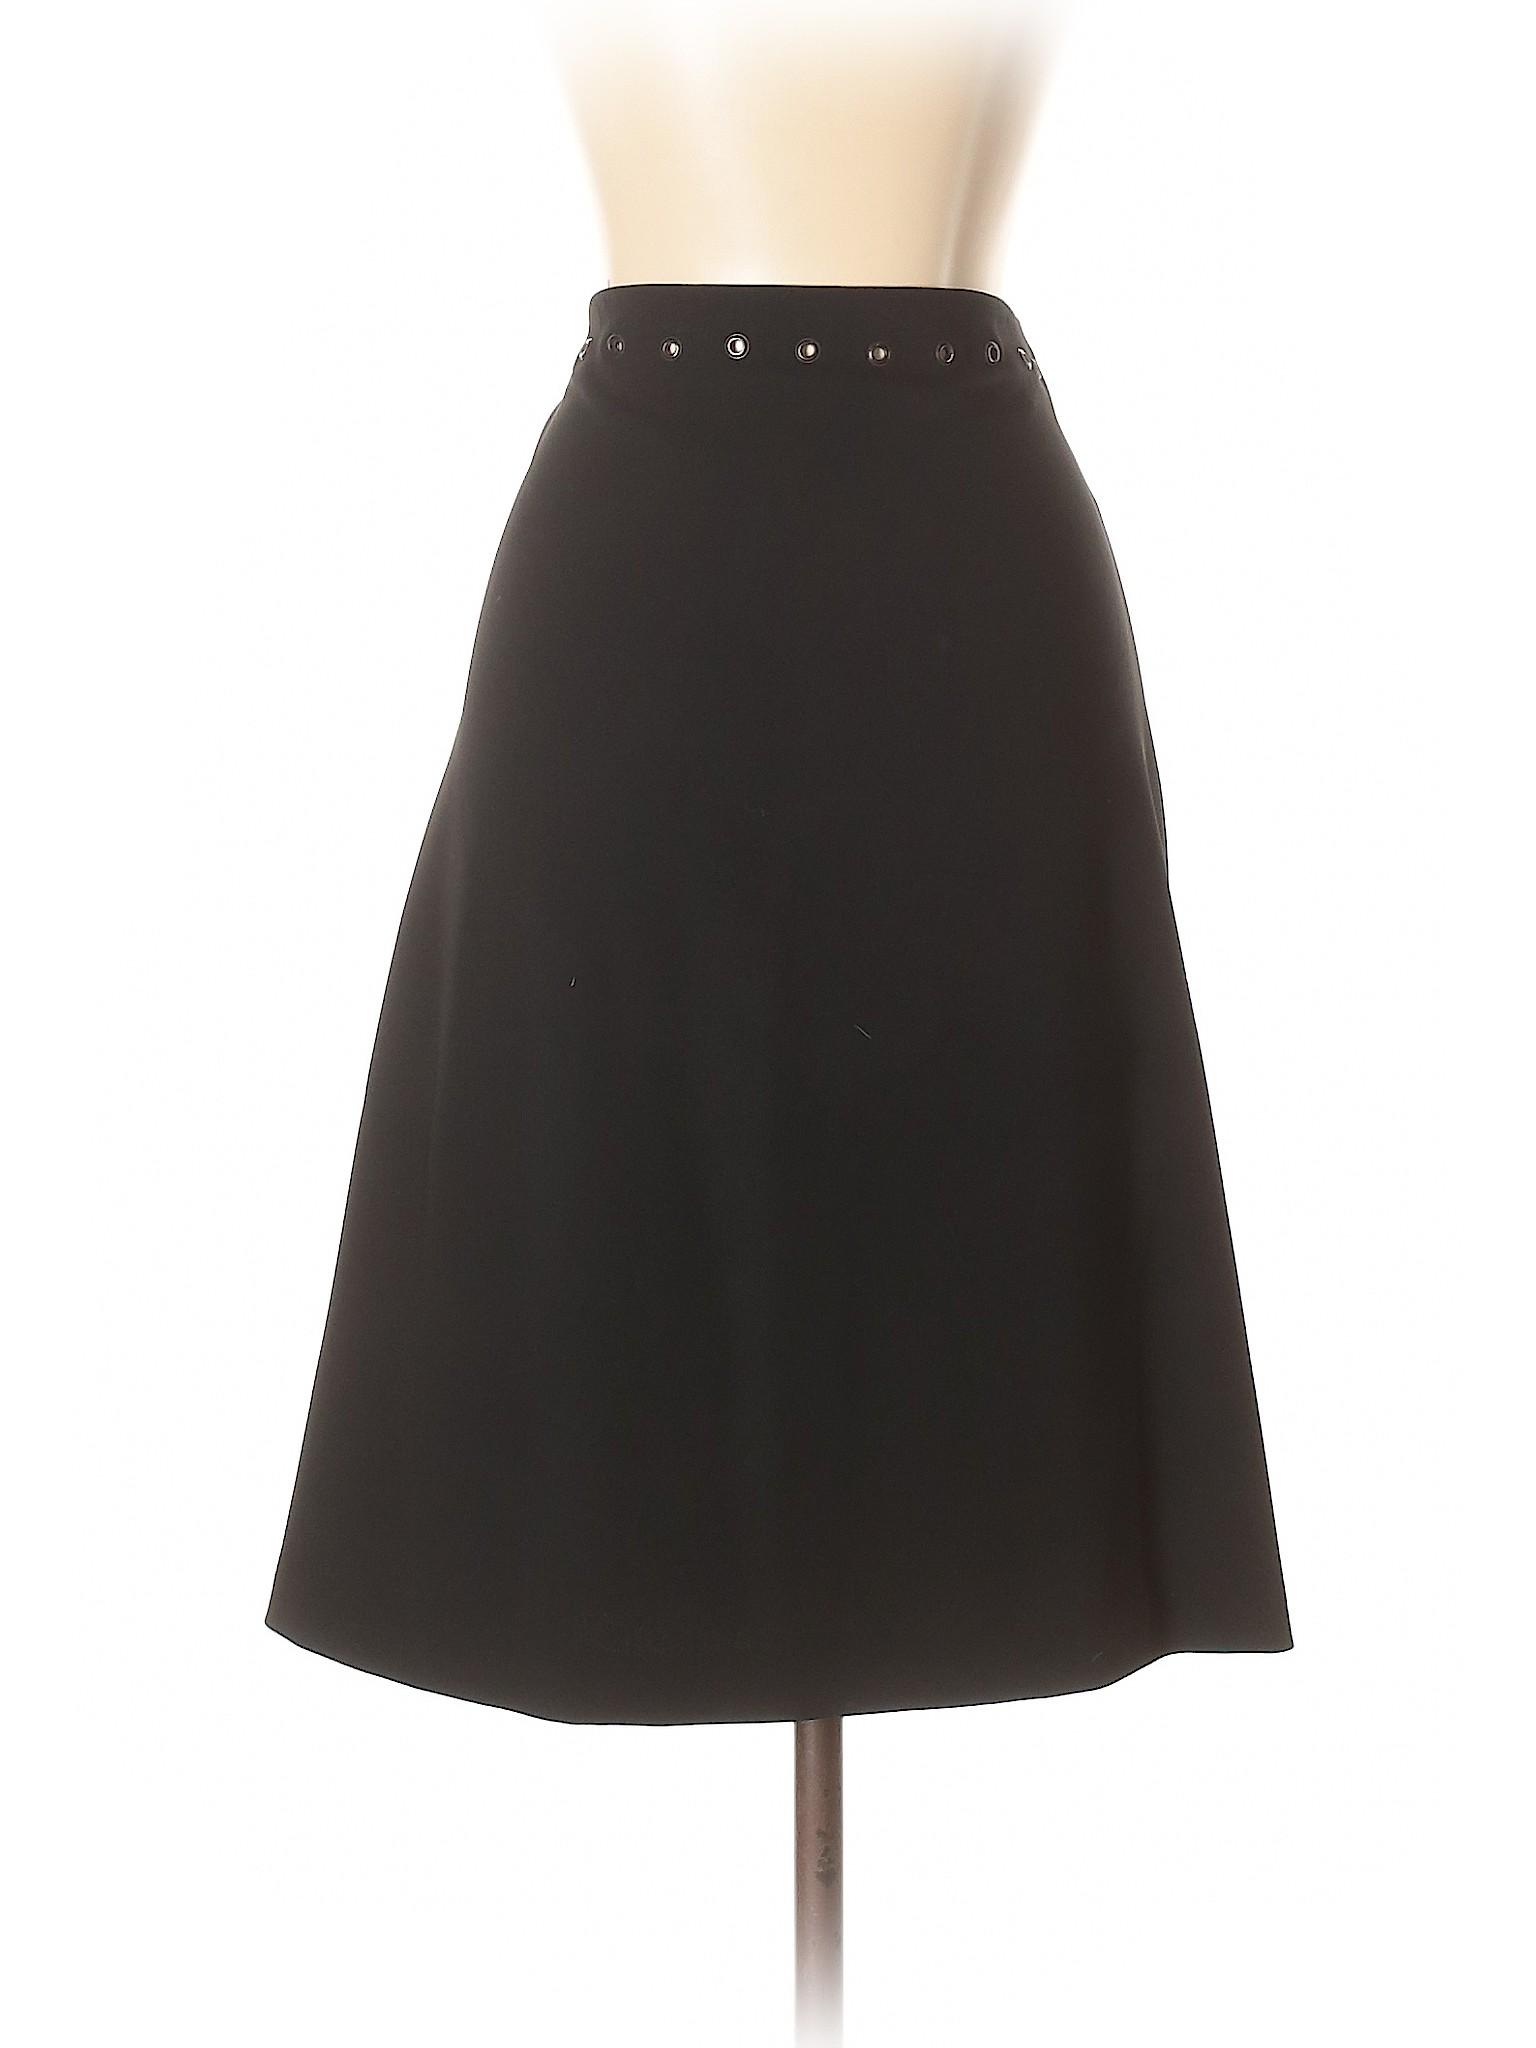 Boutique Skirt Skirt Skirt Boutique Casual Casual Boutique Boutique Casual qxnSCwXECz